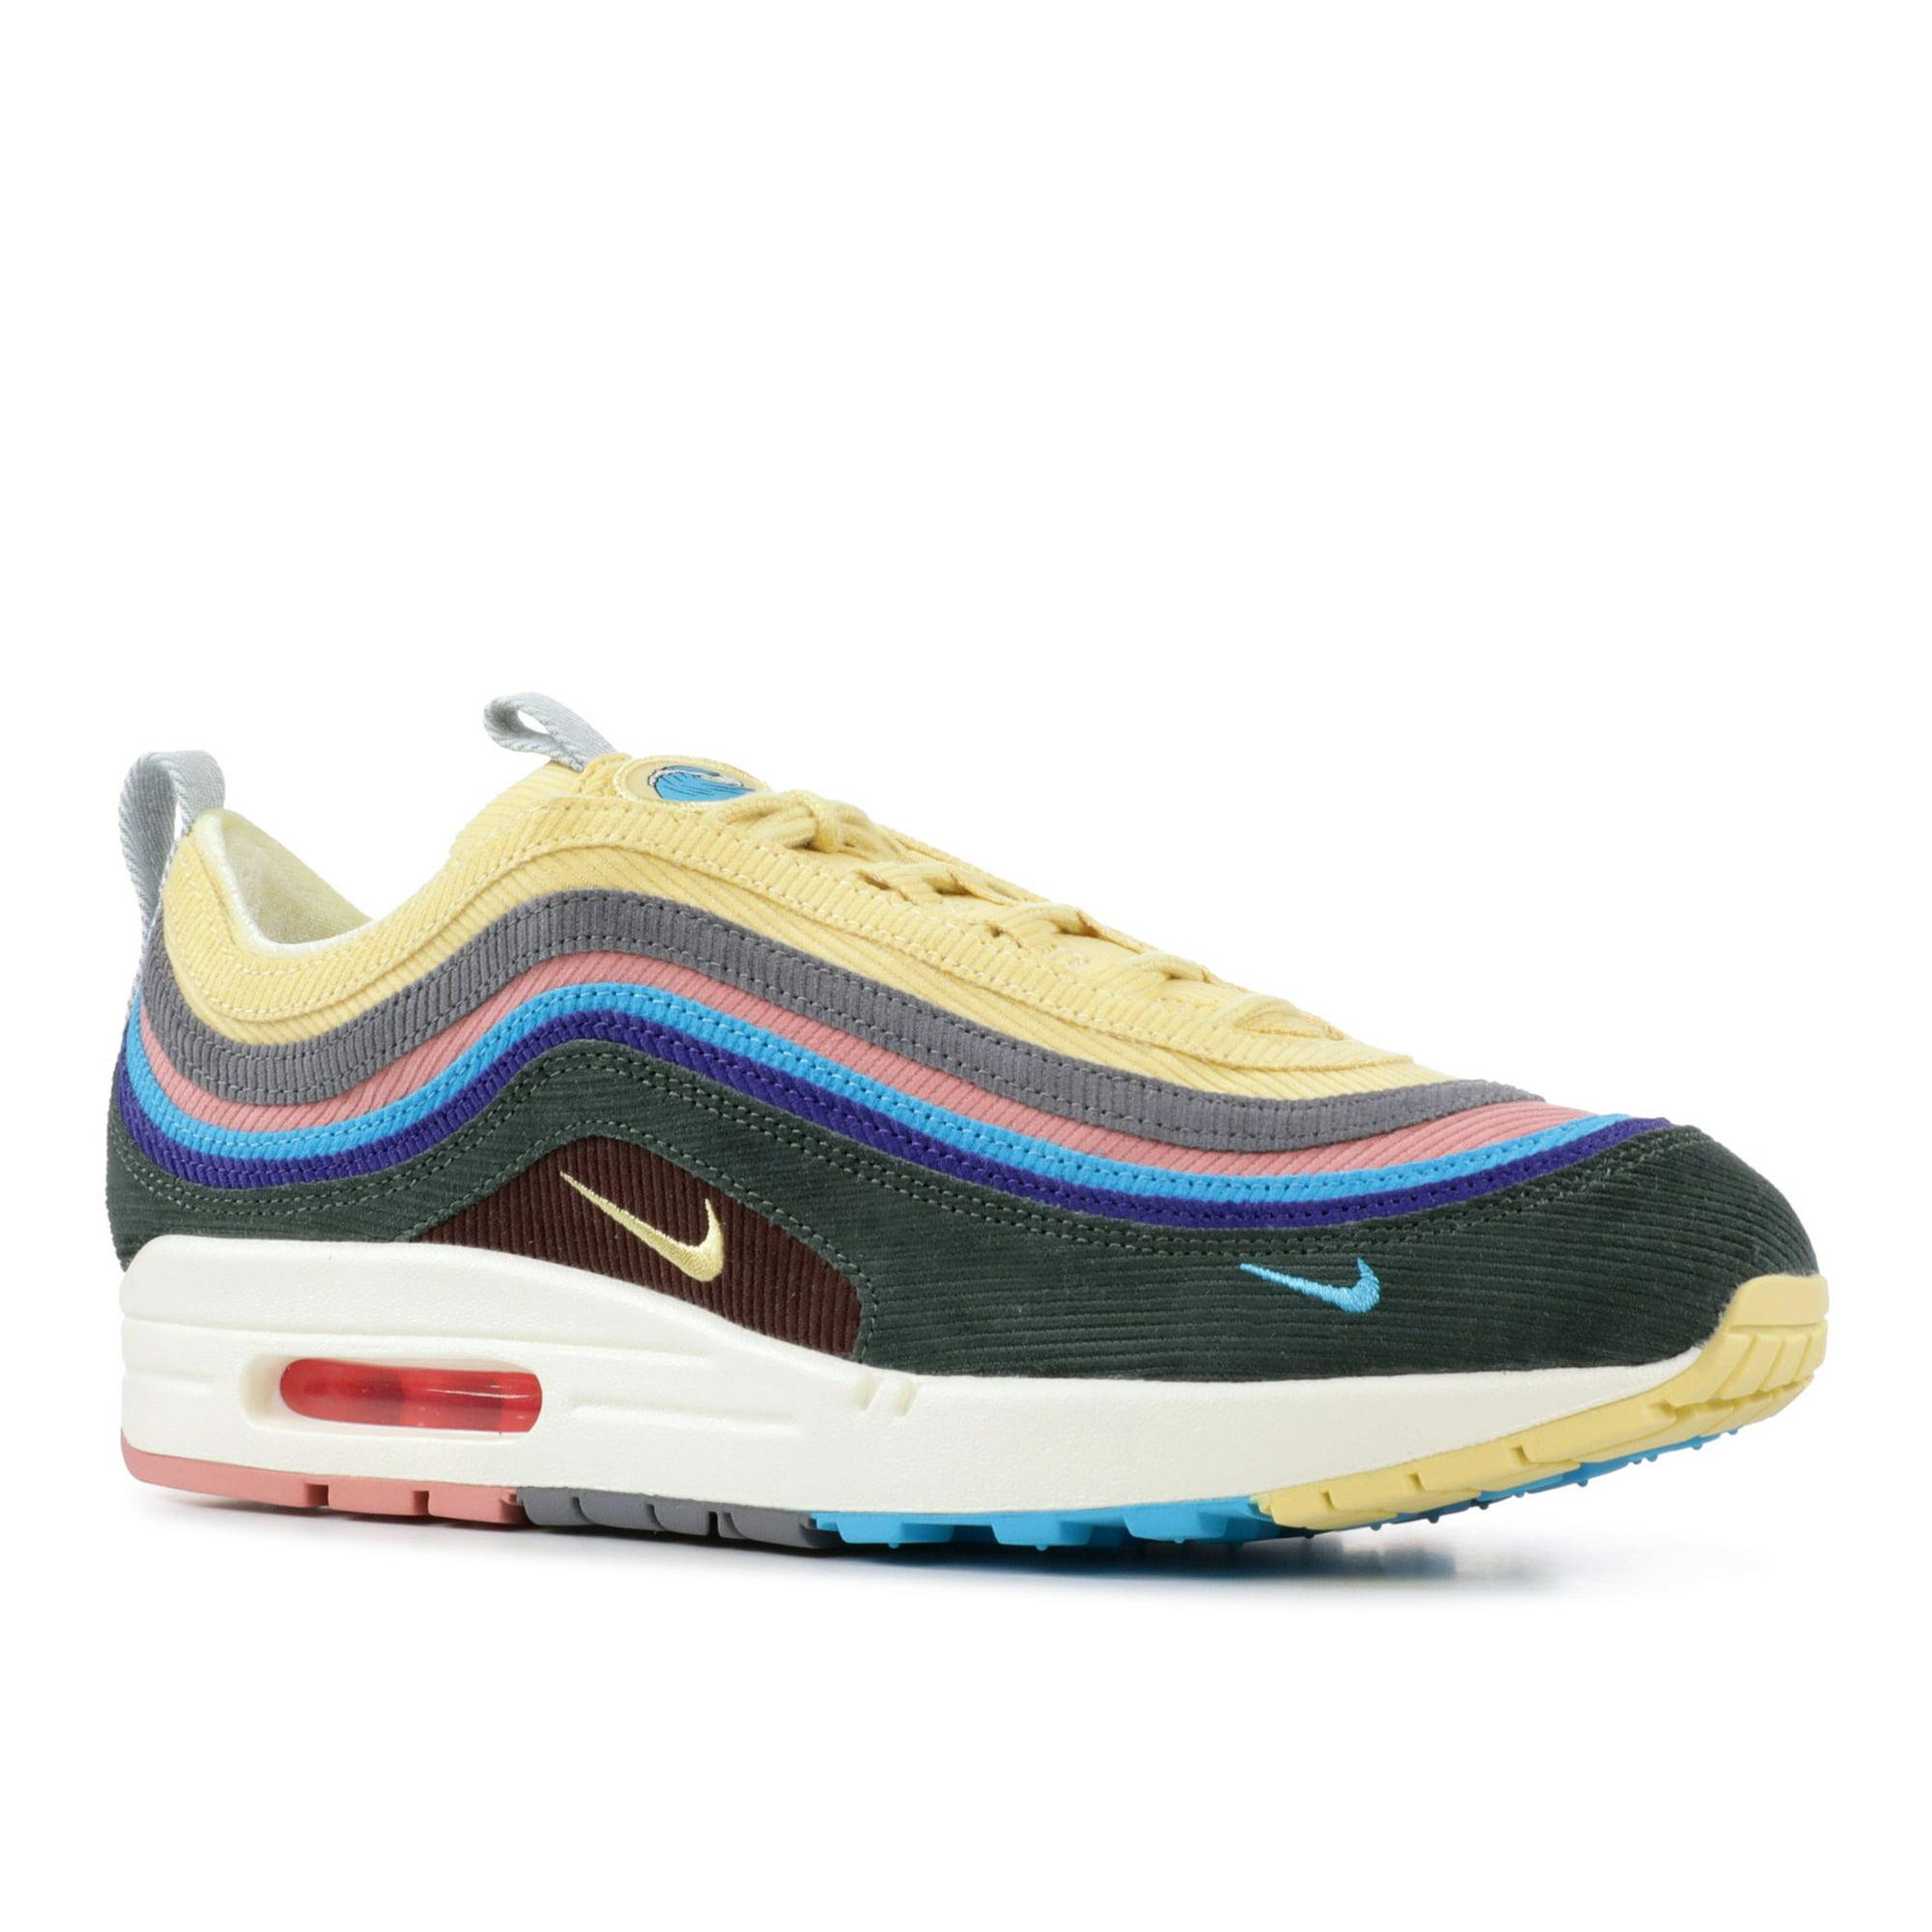 Nike Men Air Max 197 Vf Sw 'Sean Wotherspoon' Aj4219 400 Size 6